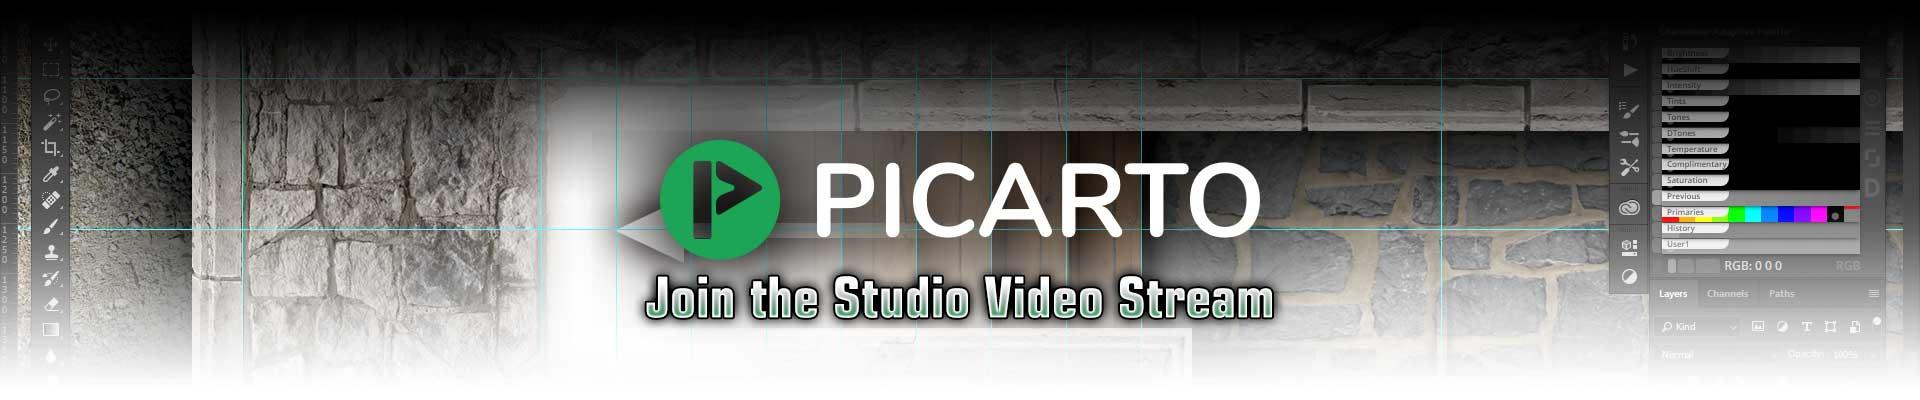 Studio Video Stream on Picarto.tv